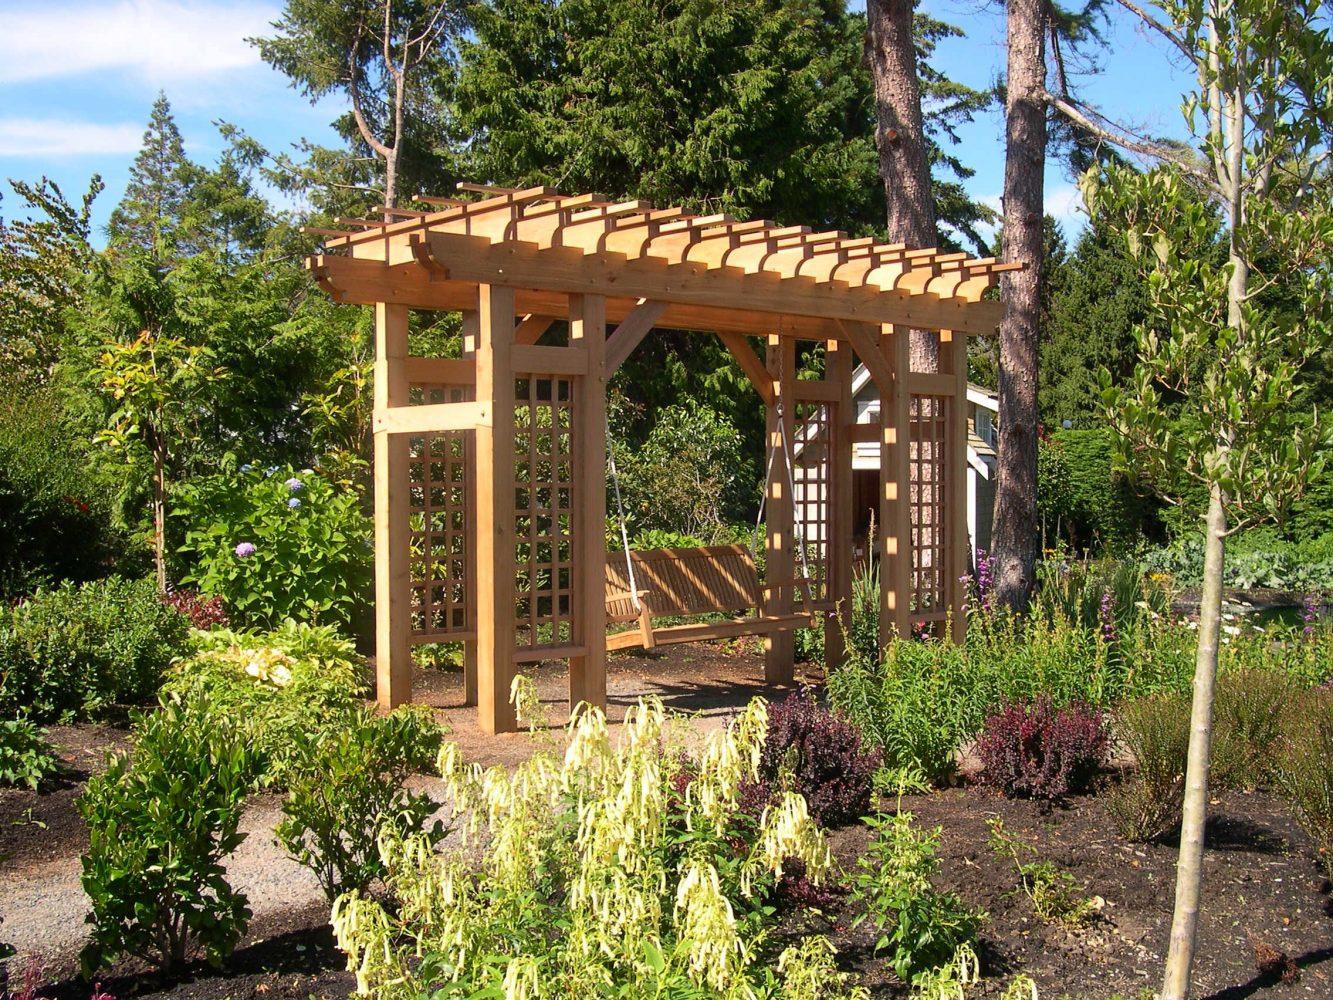 Cedar arbour with swing